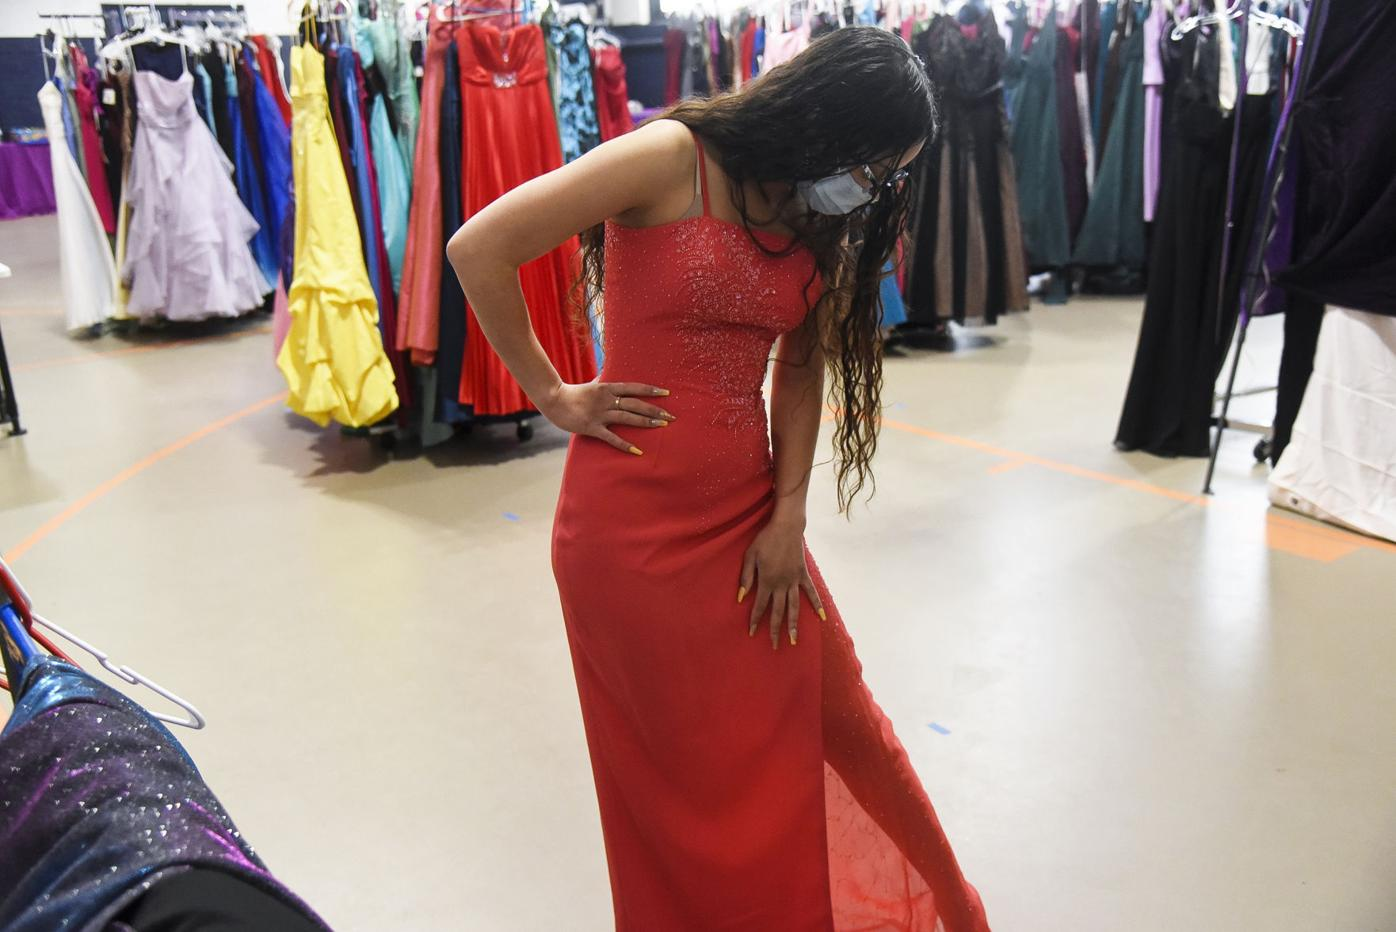 Alize Rivera tries on a prom dress